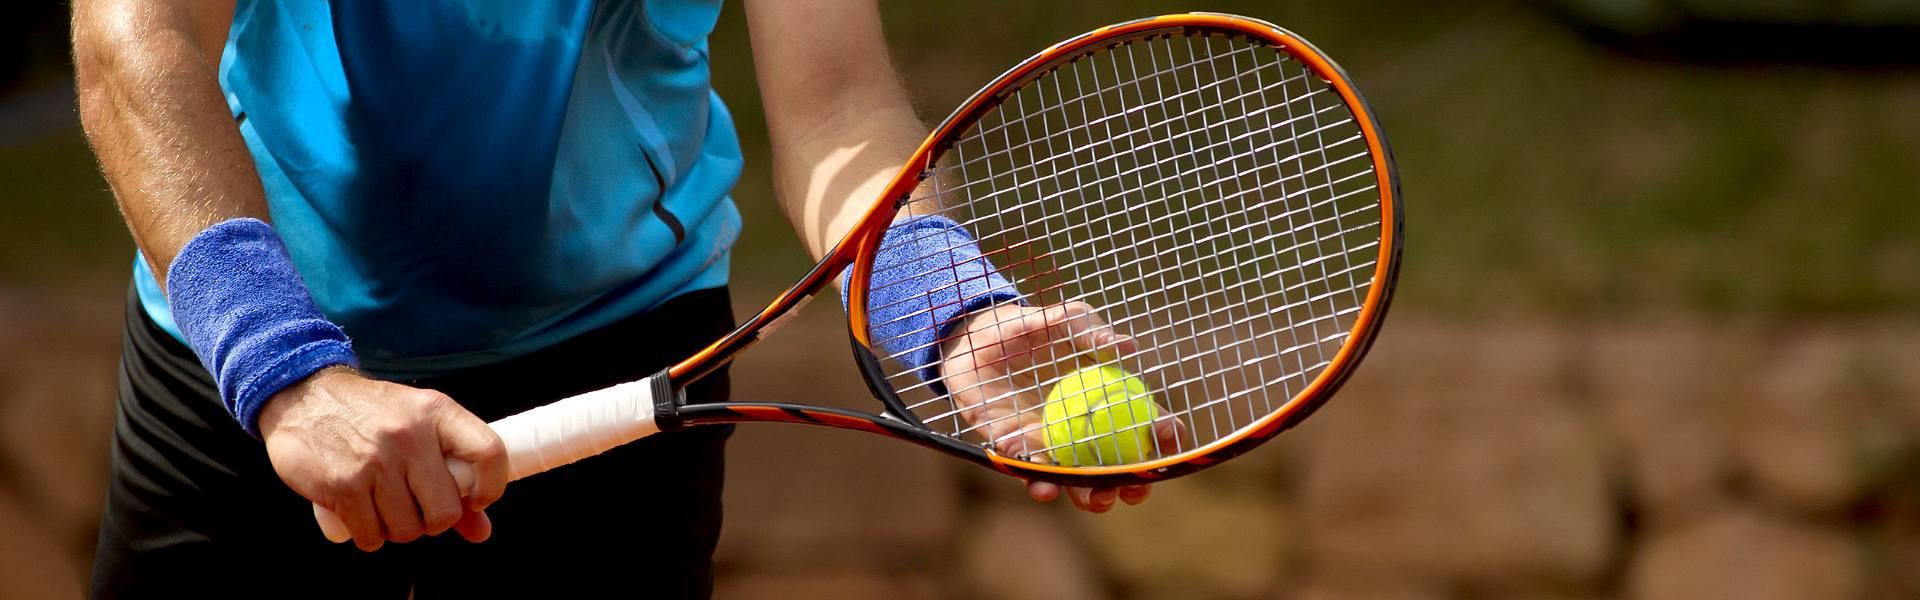 TCE - Tennis Club Enghien